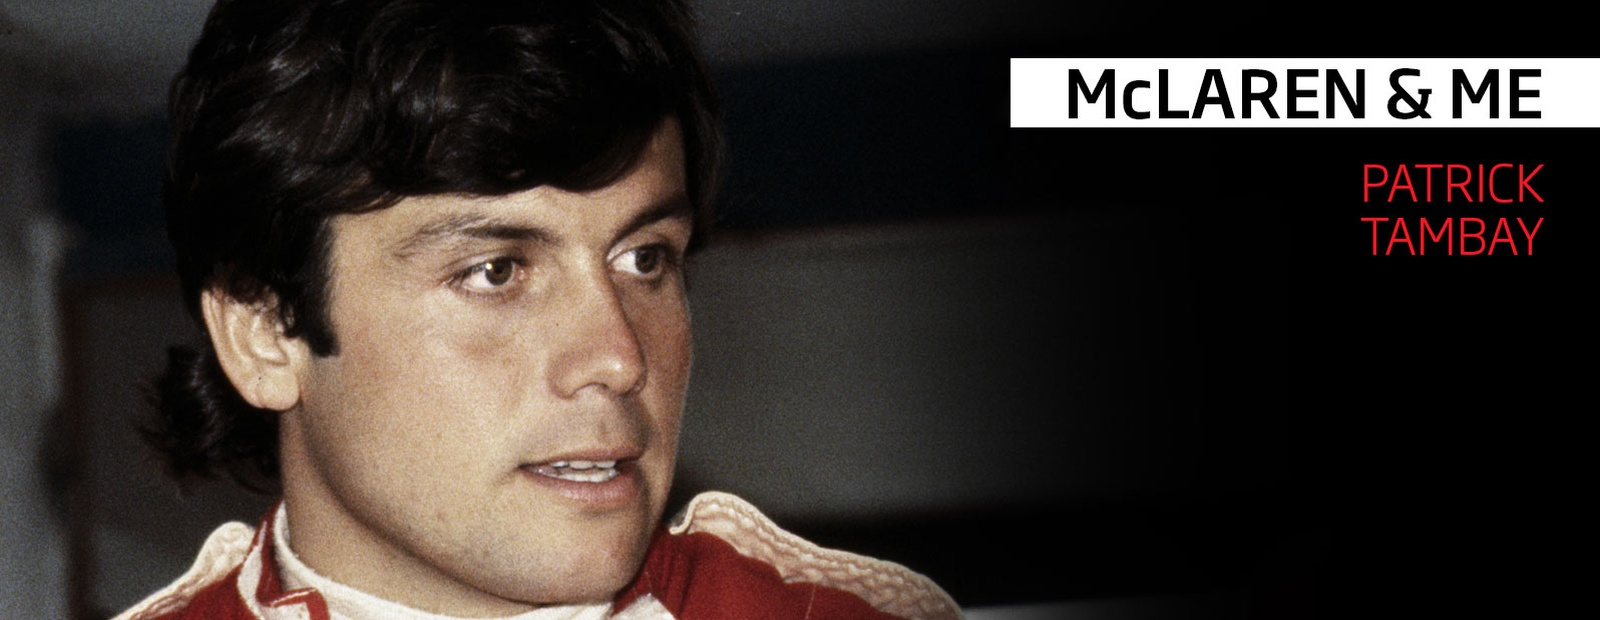 McLaren & Me: Patrick Tambay